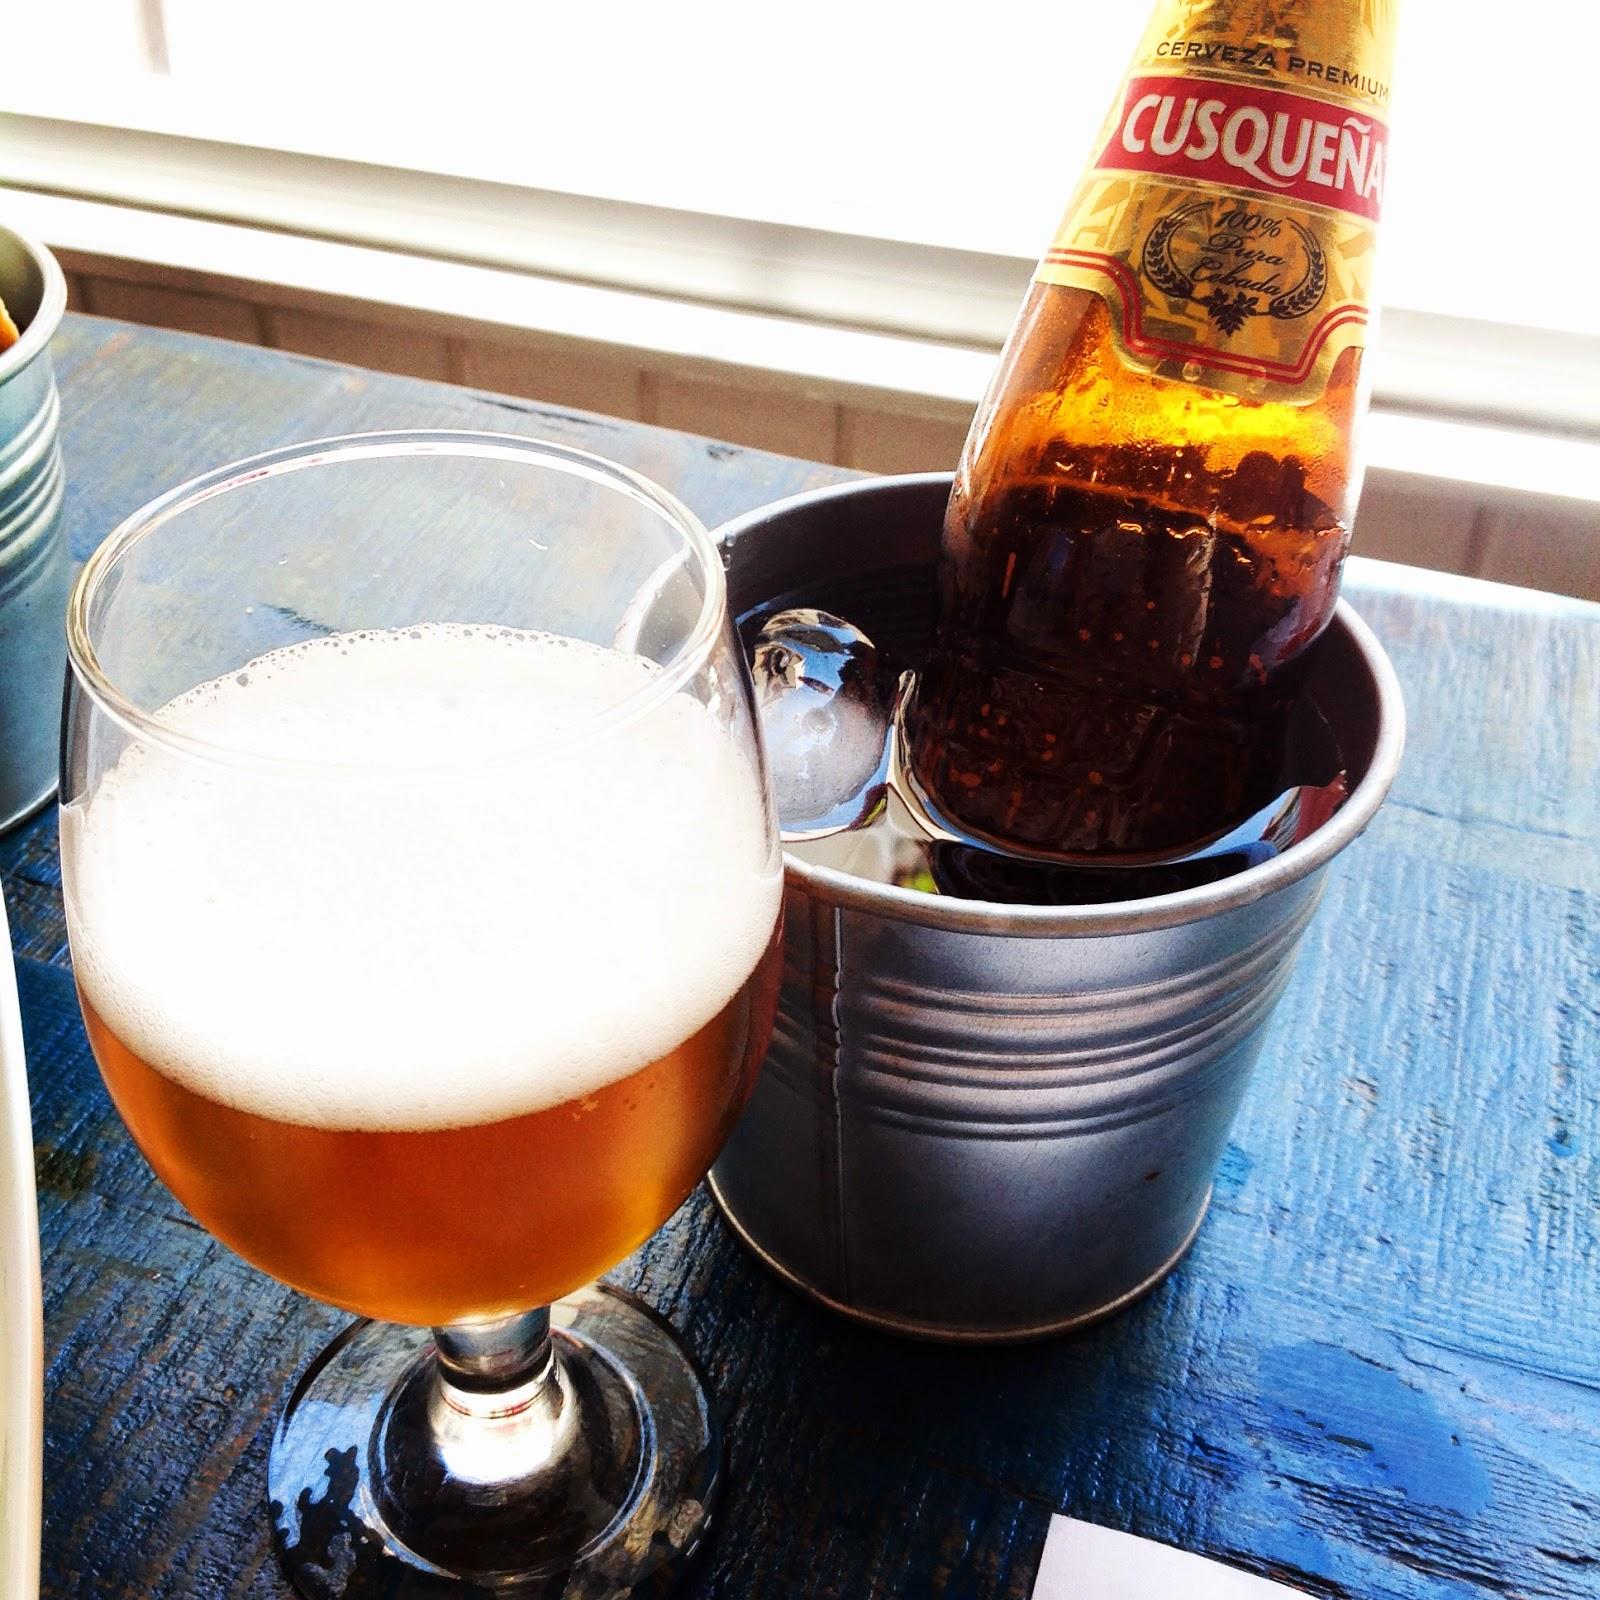 Cerveza peruana Cusqueña